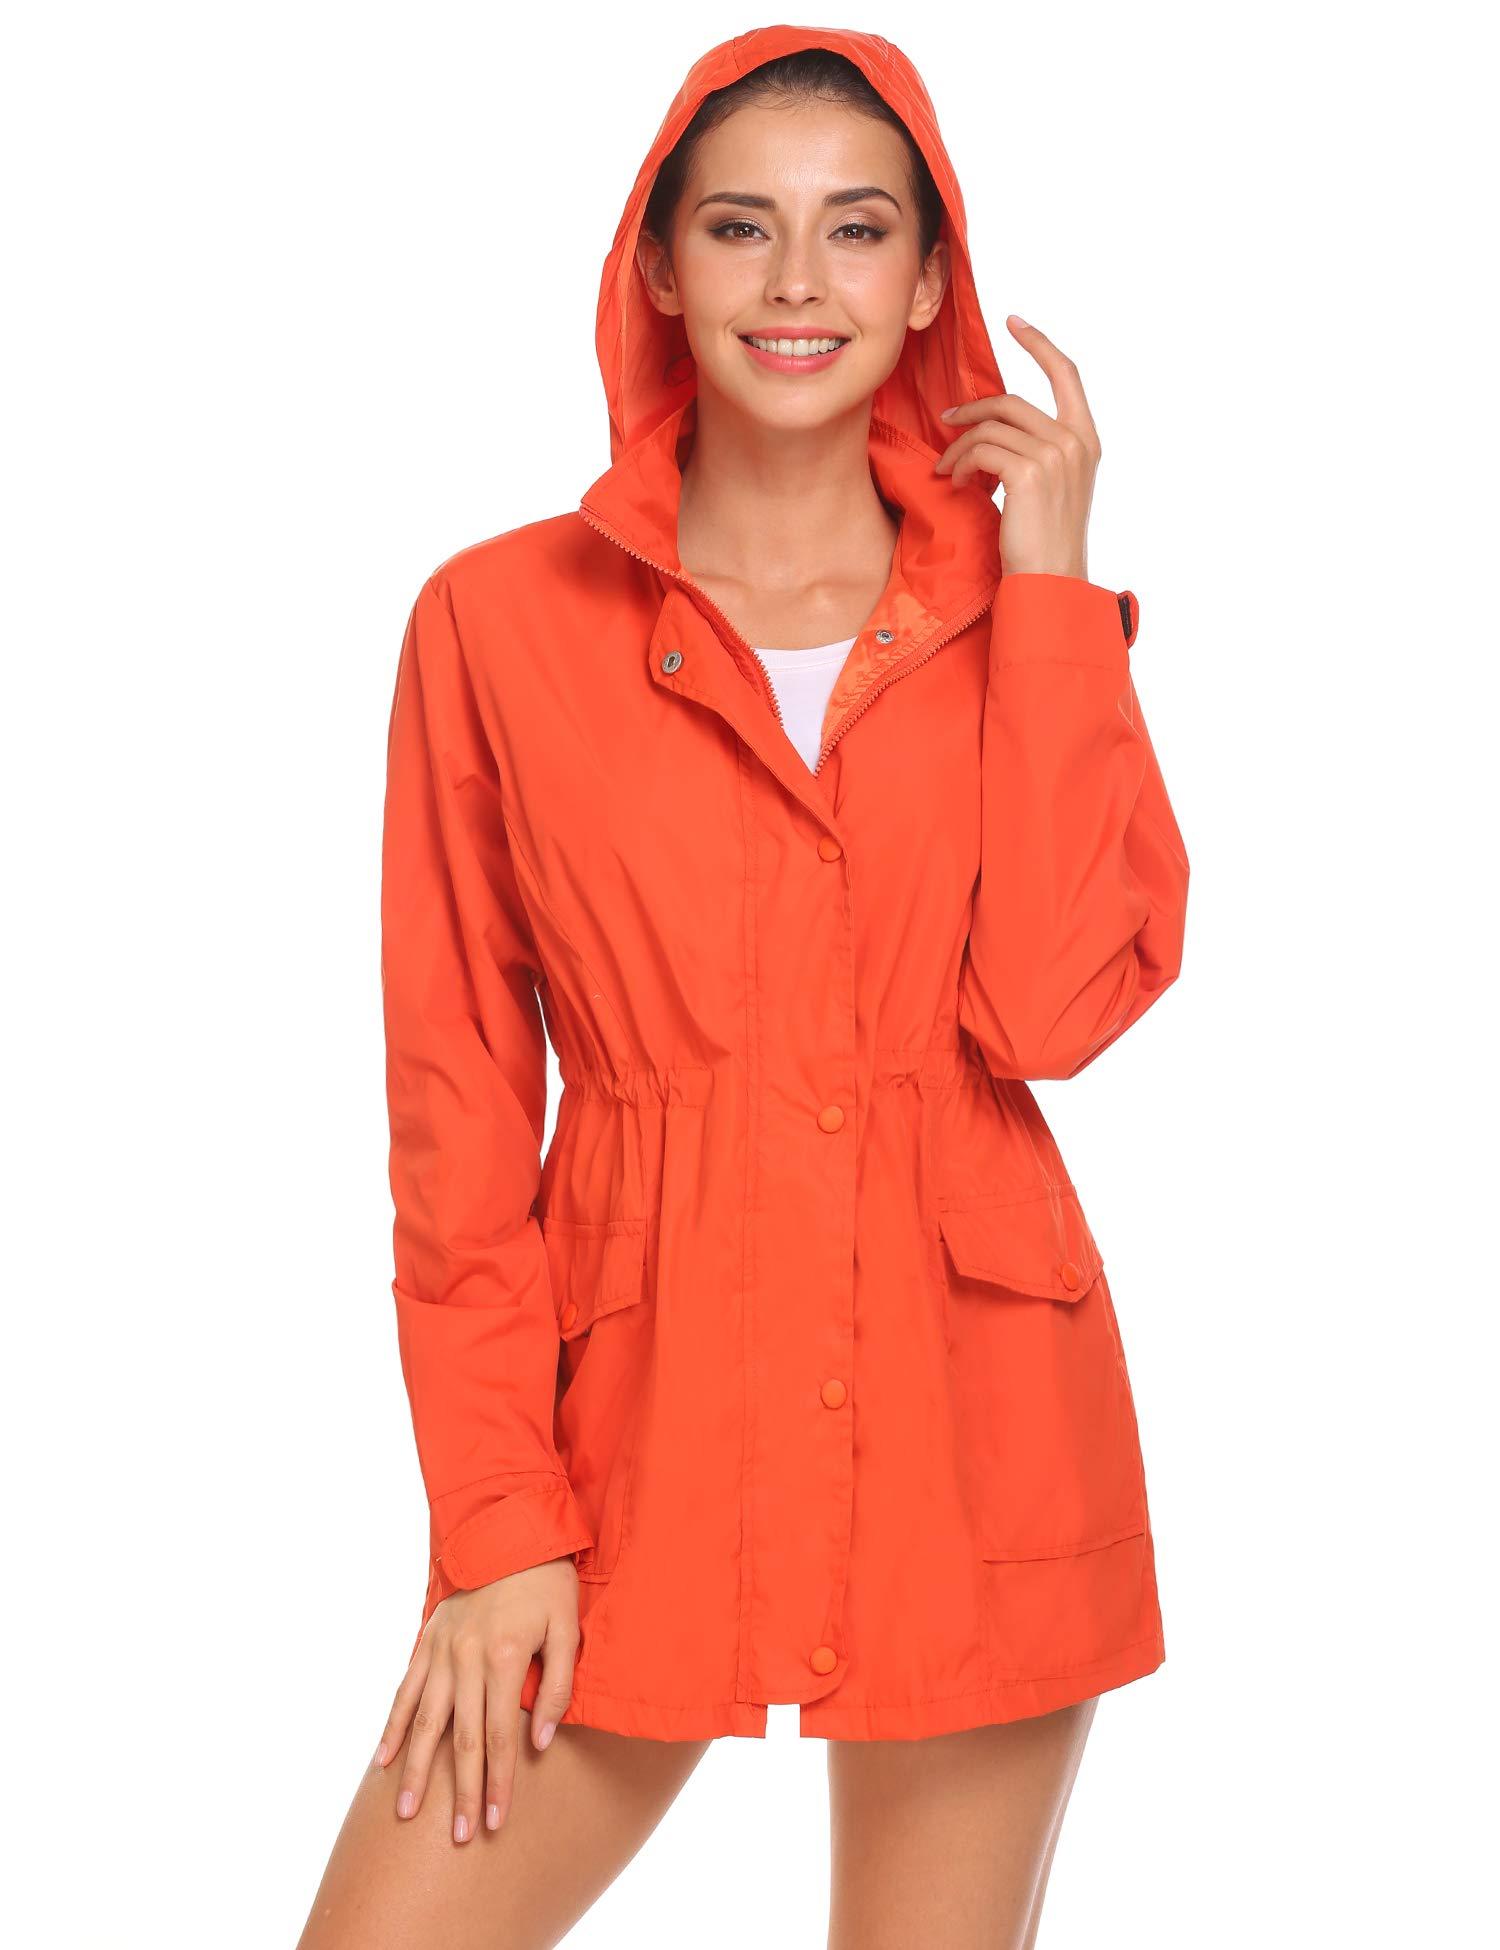 Beyove Womens Waterproof Raincoat Lightweight Rain Jacket Hooded Windbreaker with Pocket for Outdoor